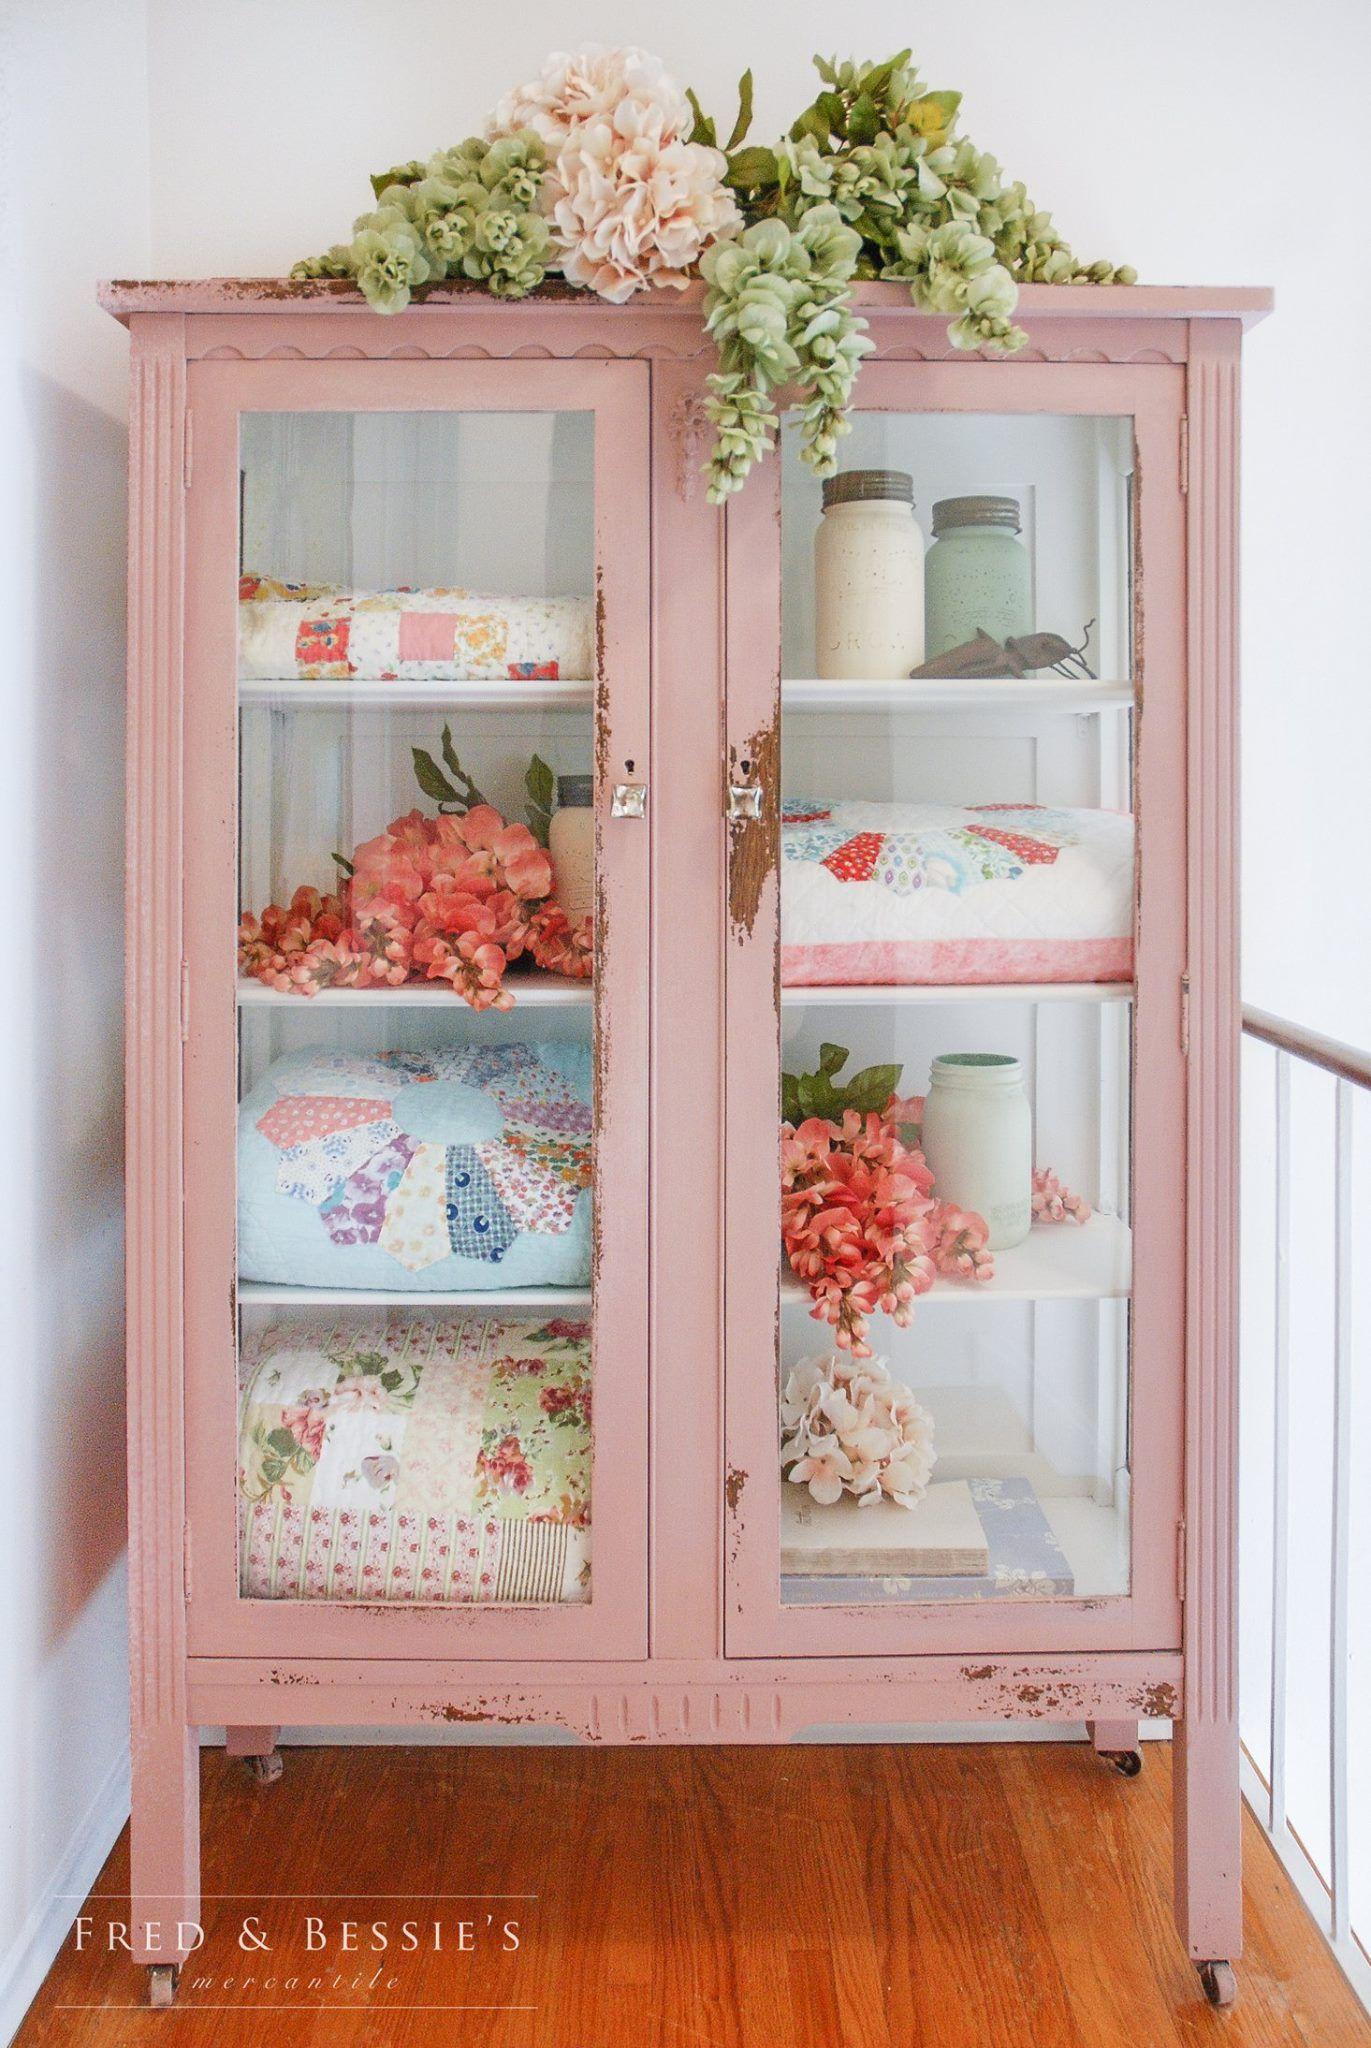 Pin de liliana albores en Home restauraciones | Pinterest ...